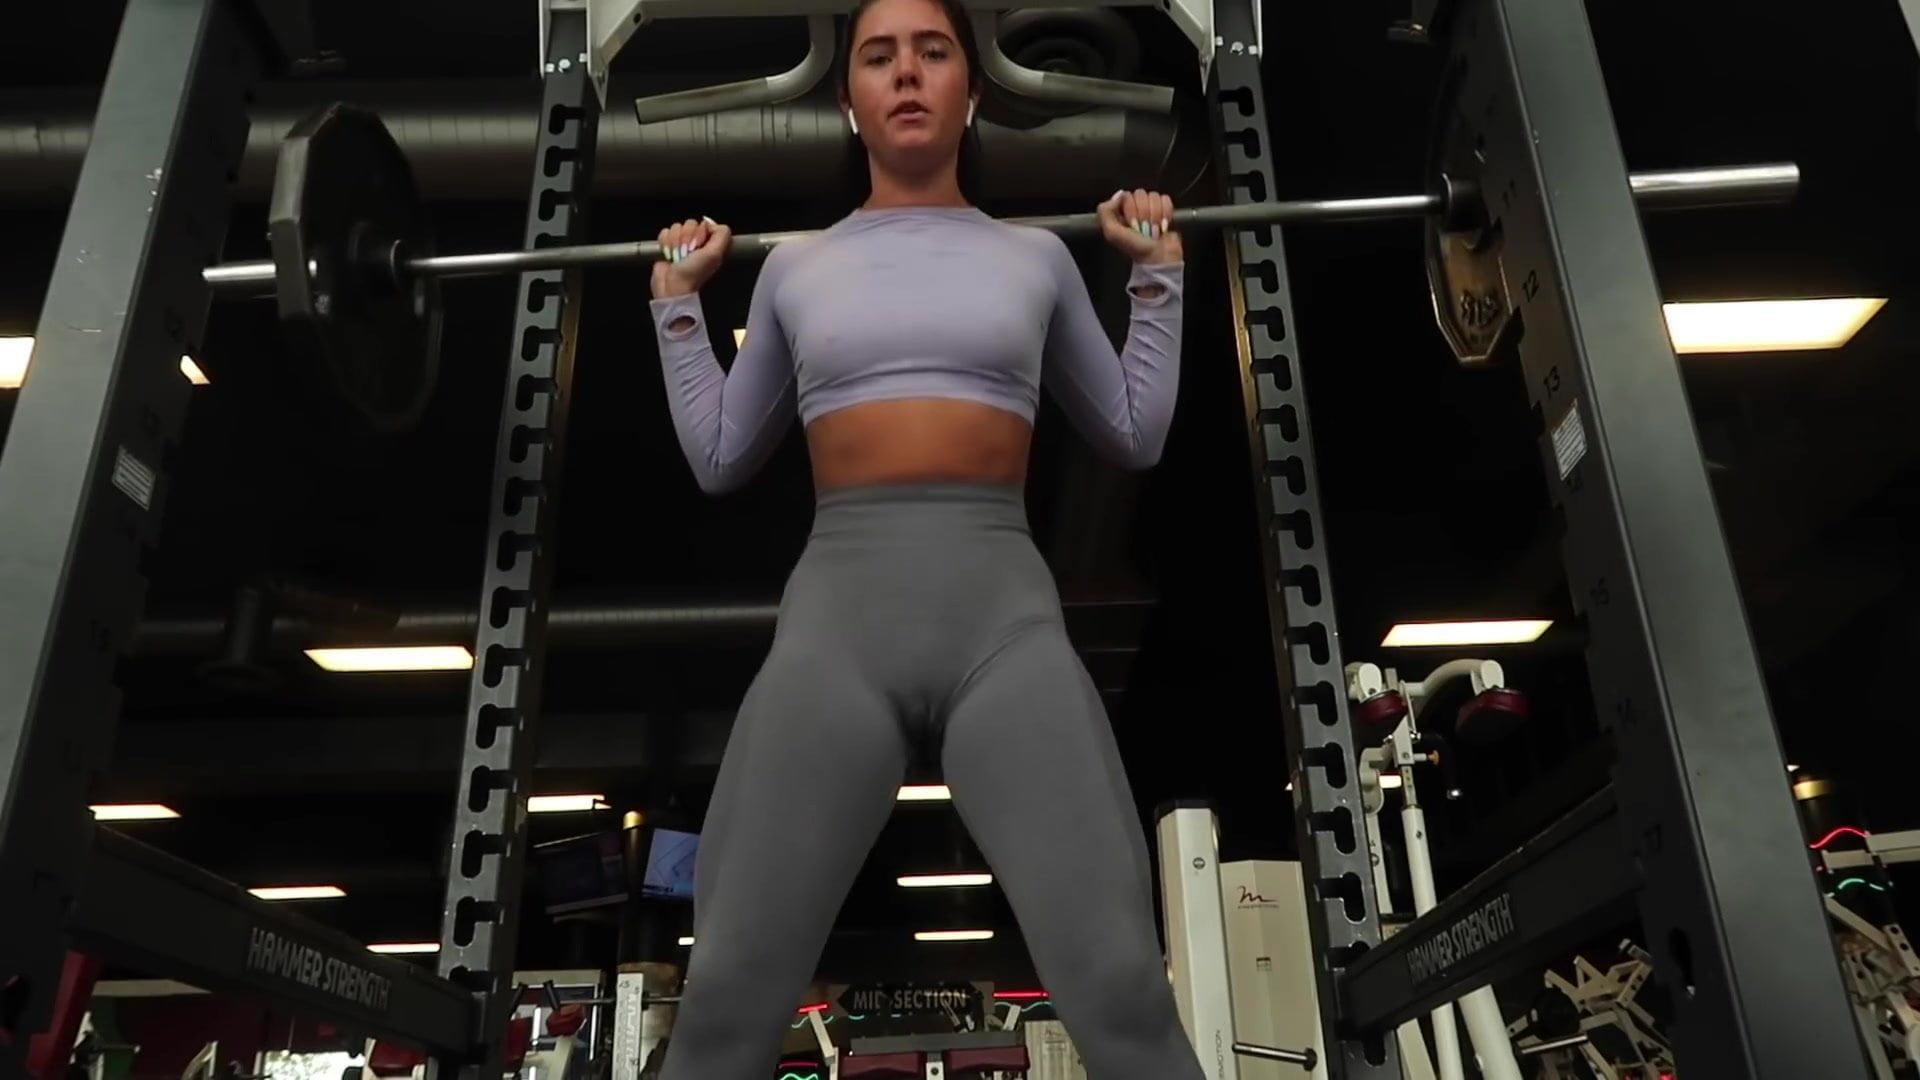 Gym cameltoe The 12